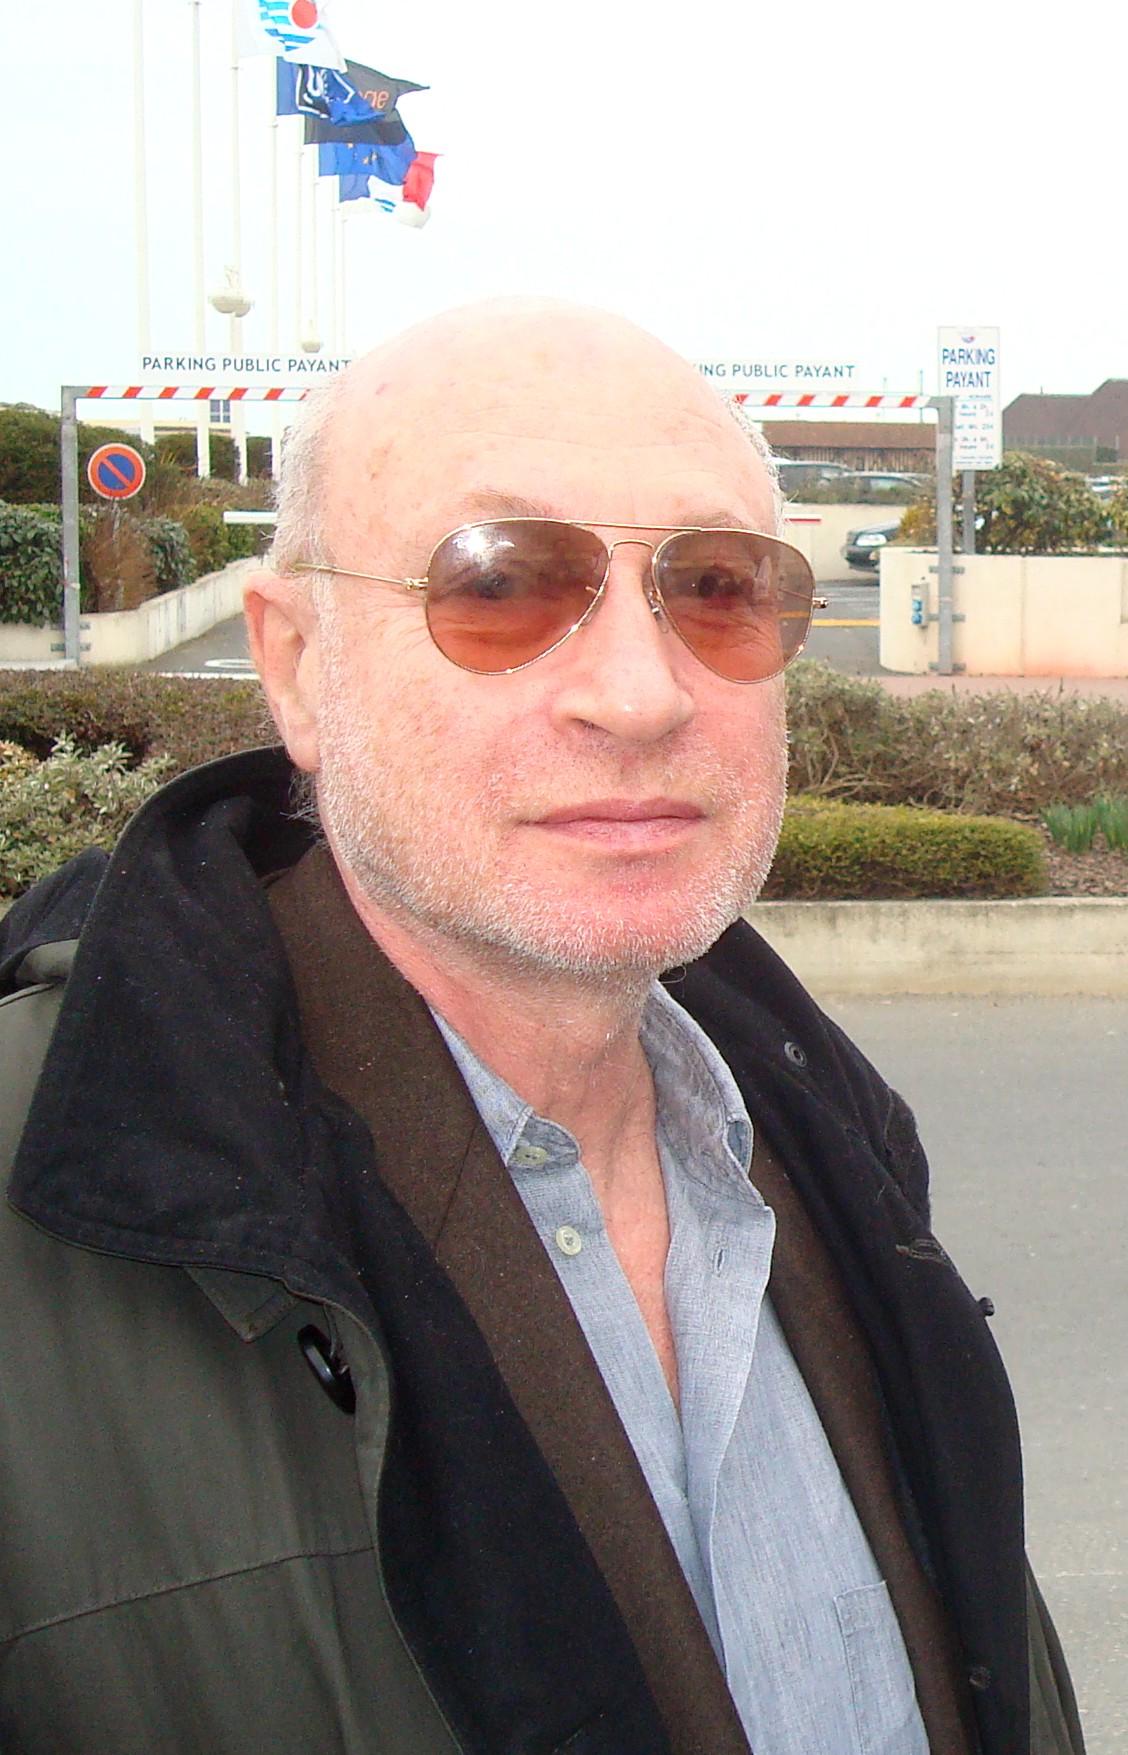 Pascal Bonitzer in 2010